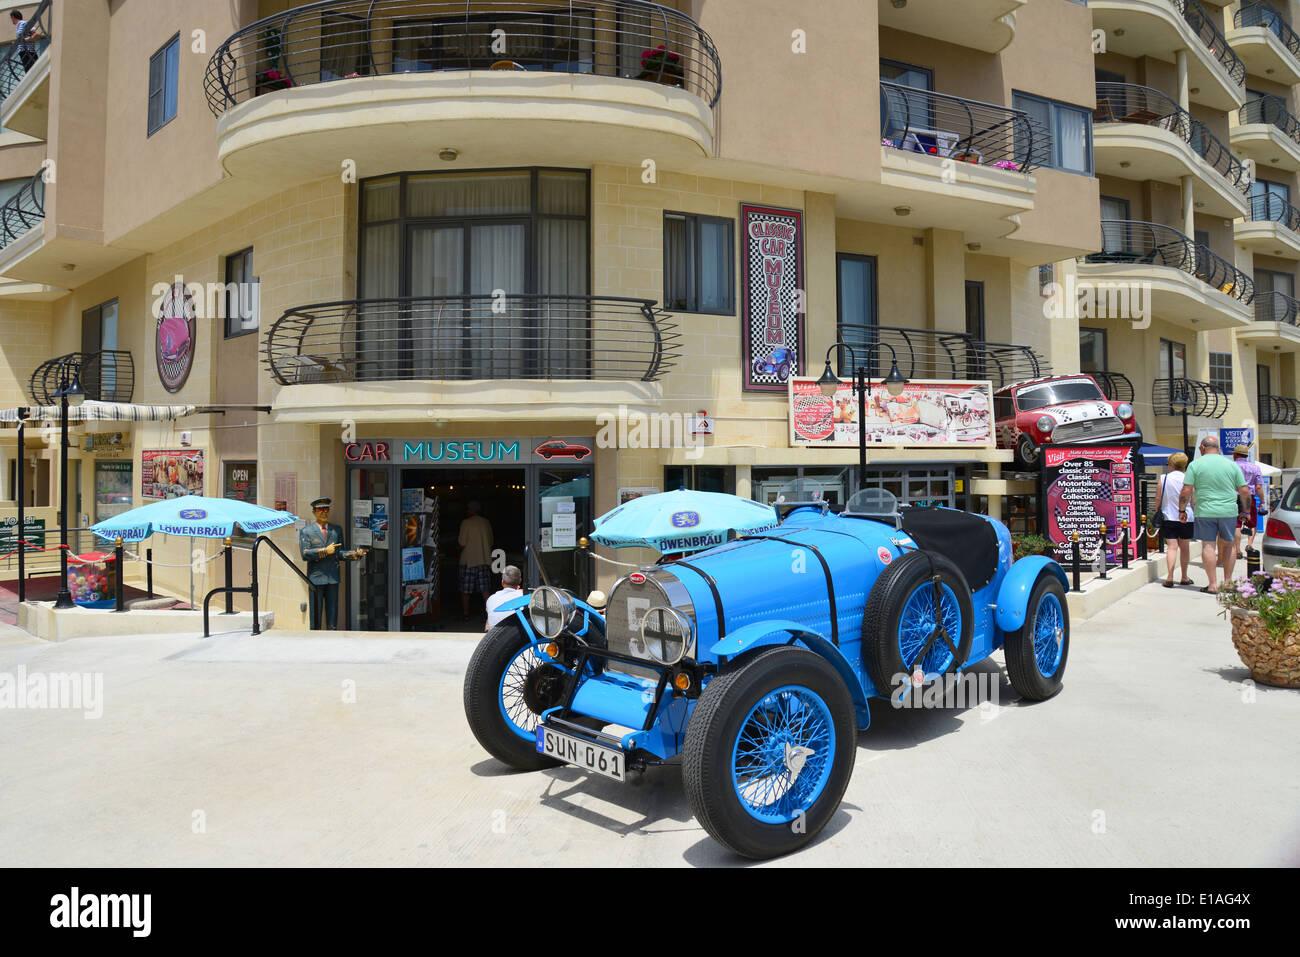 Funky Illinois Car Museum Ensign - Classic Cars Ideas - boiq.info